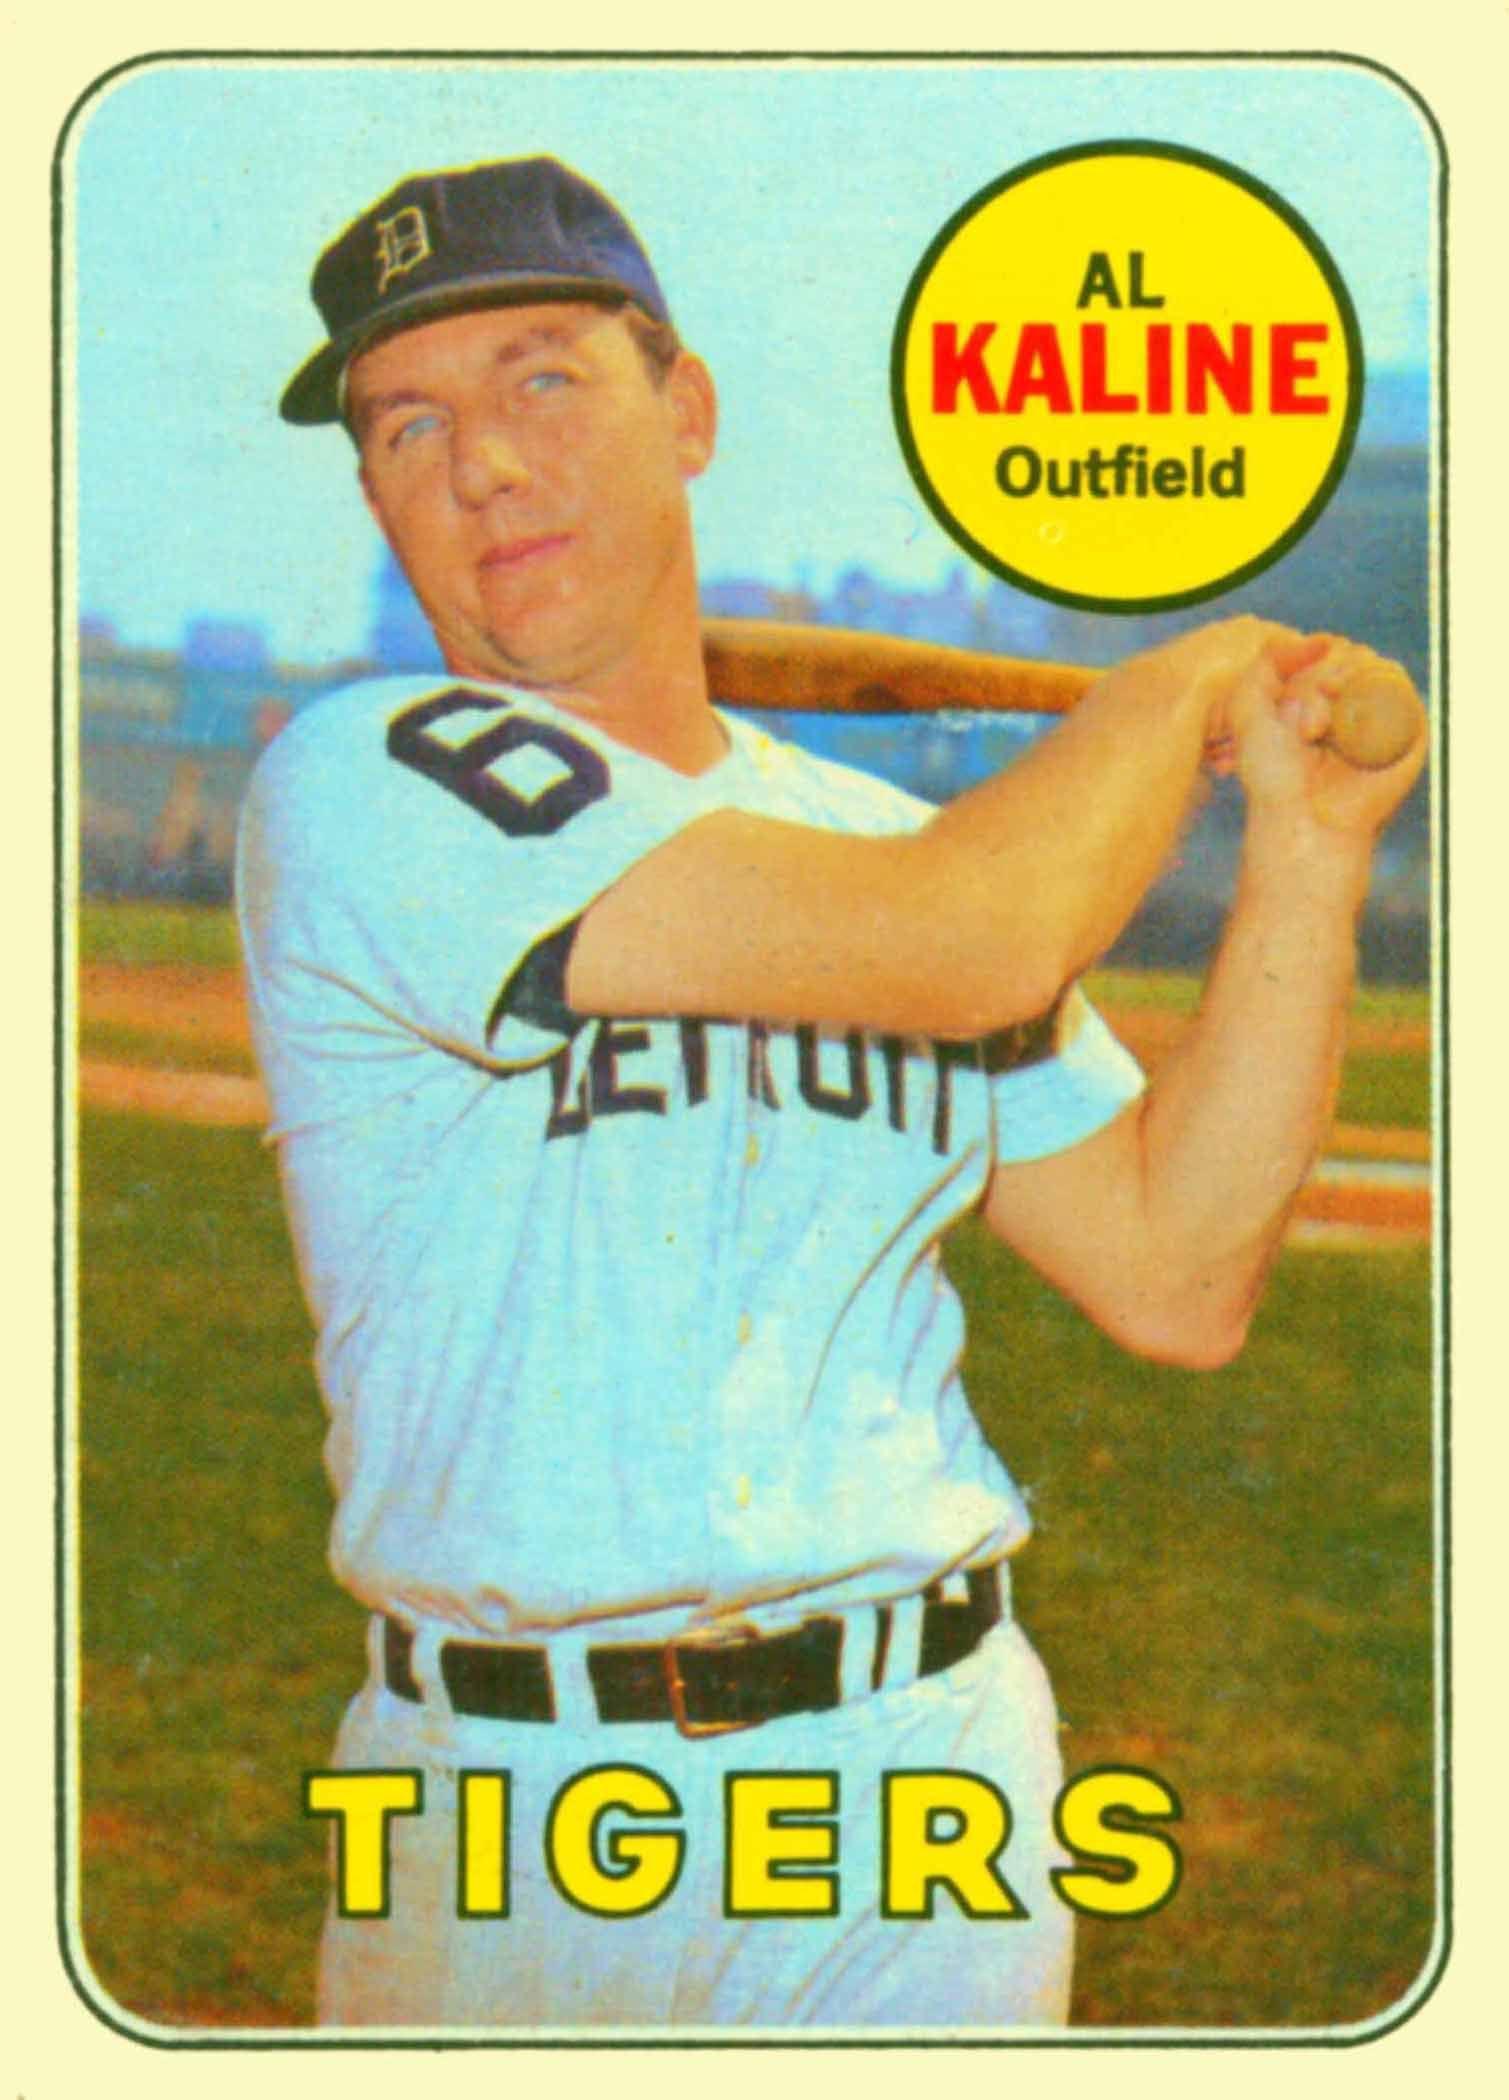 1969 topps al kaline baseball card values baseball